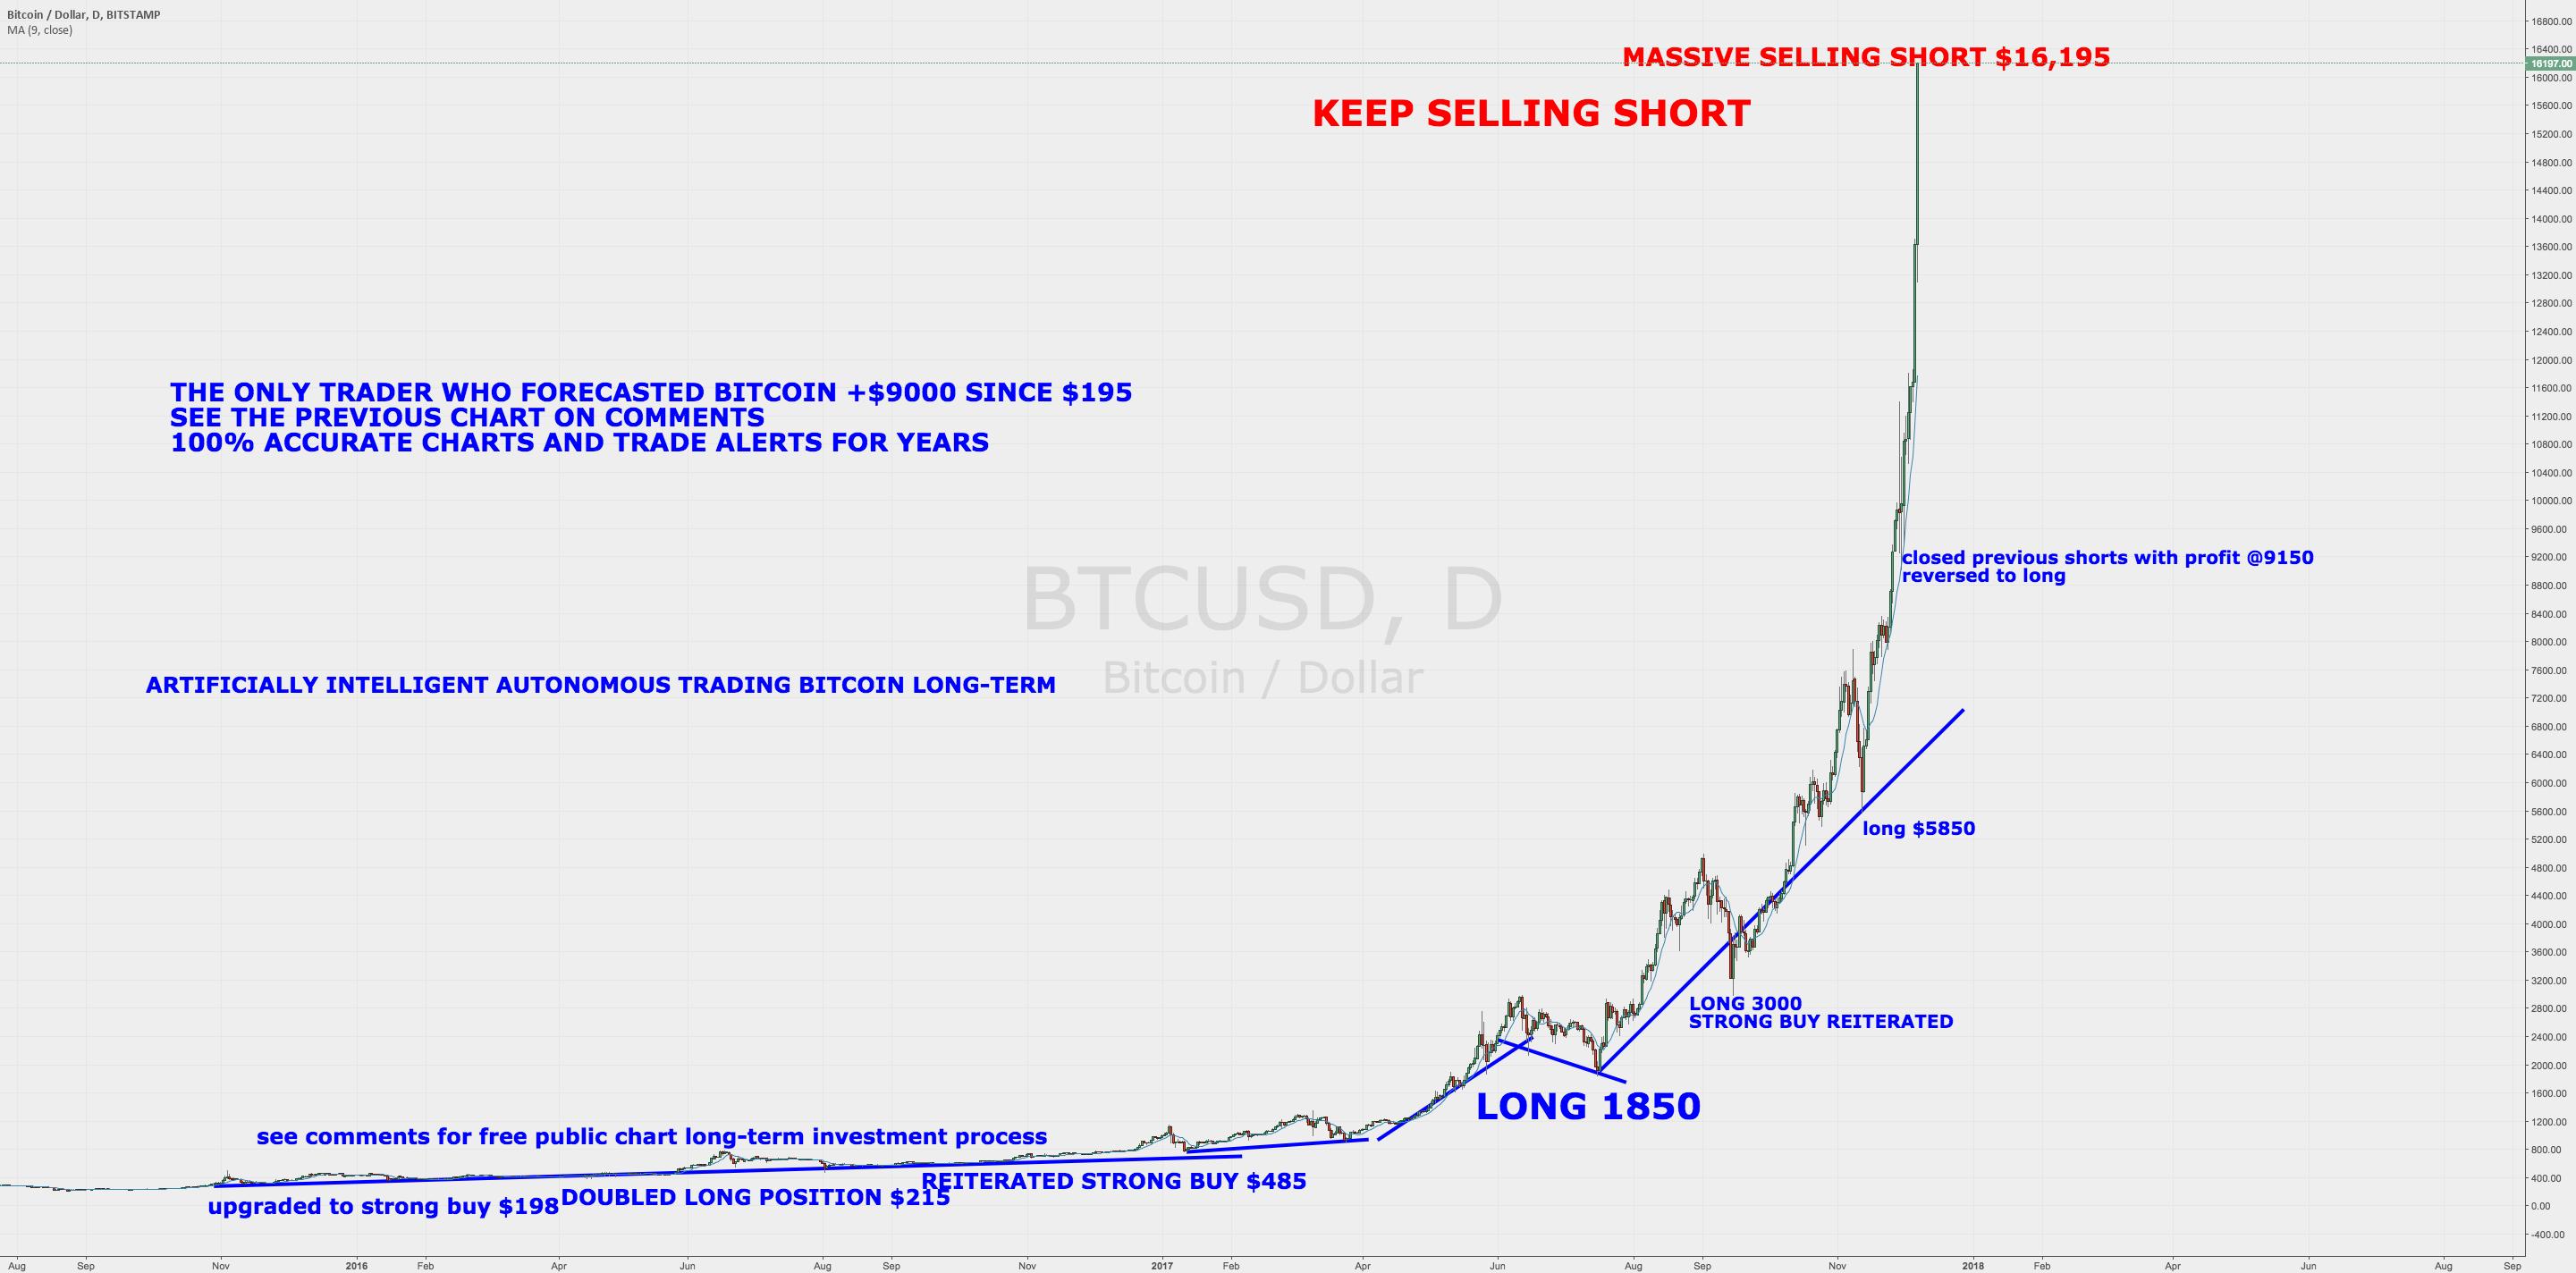 LiveStream Massive Selling Short BitCoin 16,195 $BTCUSD